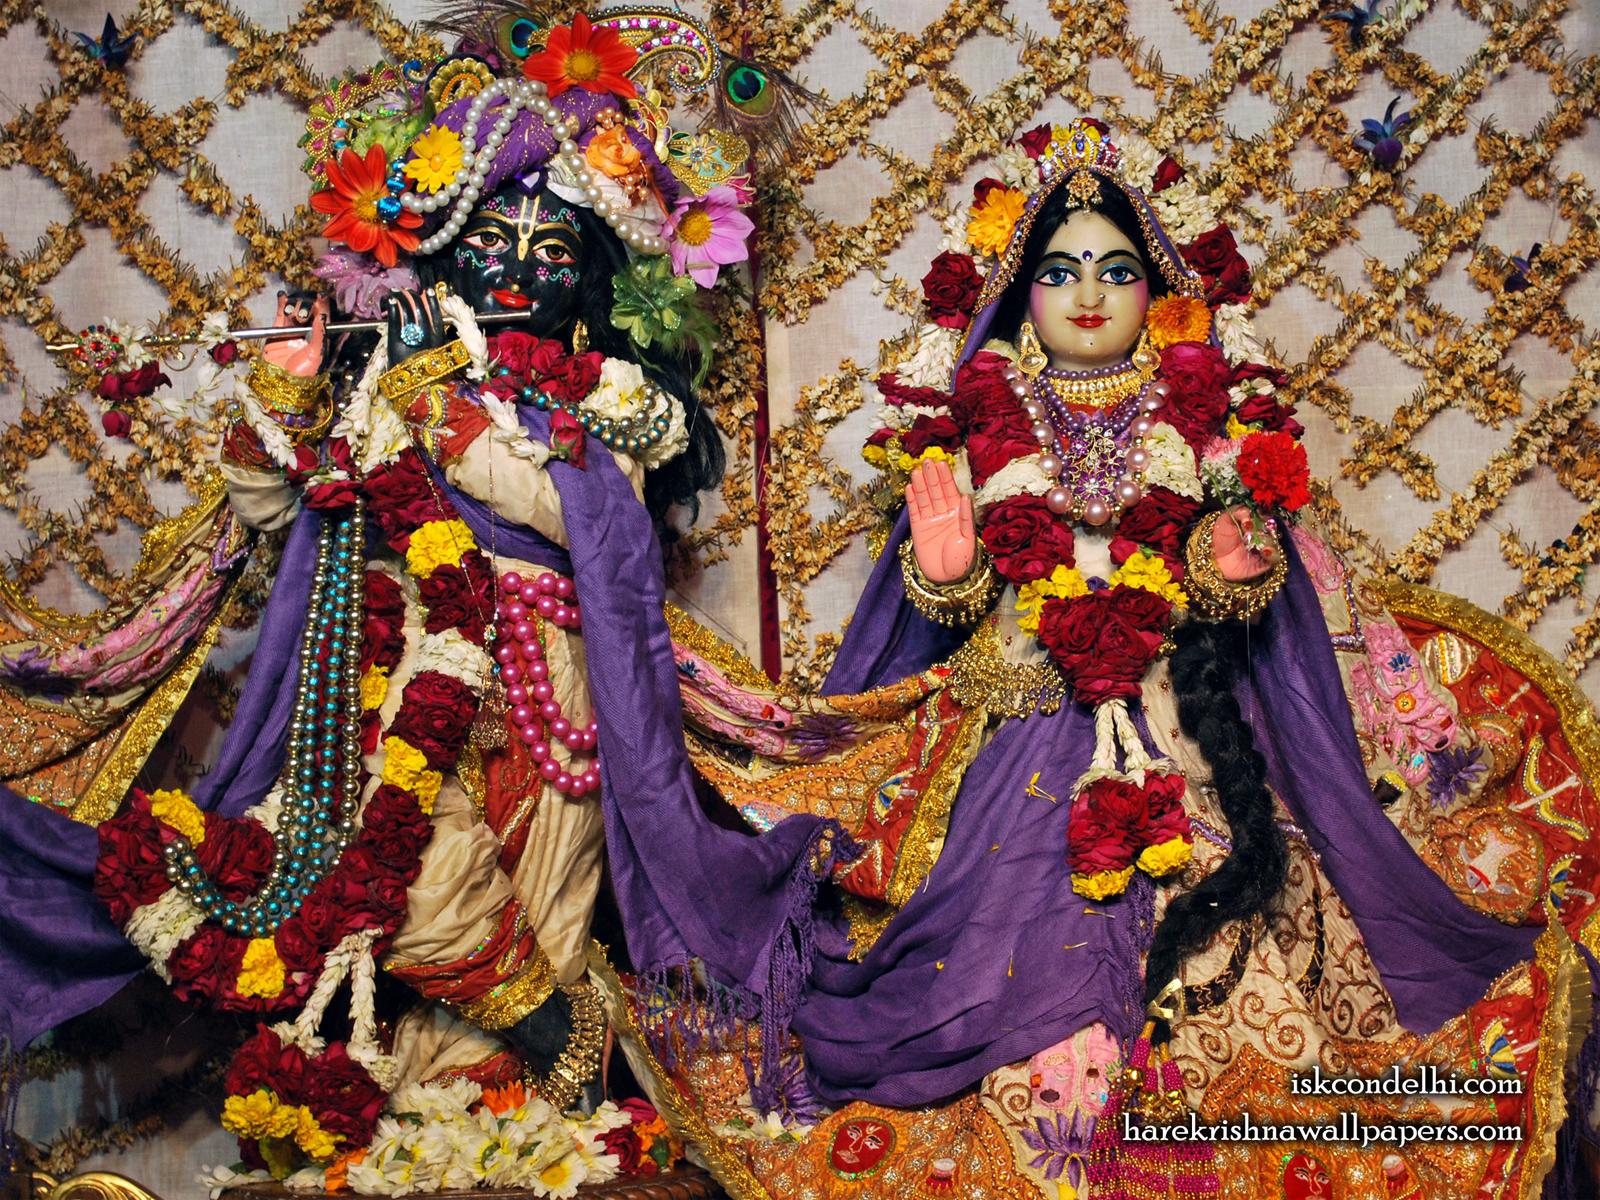 Sri Sri Radha Parthasarathi Wallpaper (005) Size1600x1200 Download